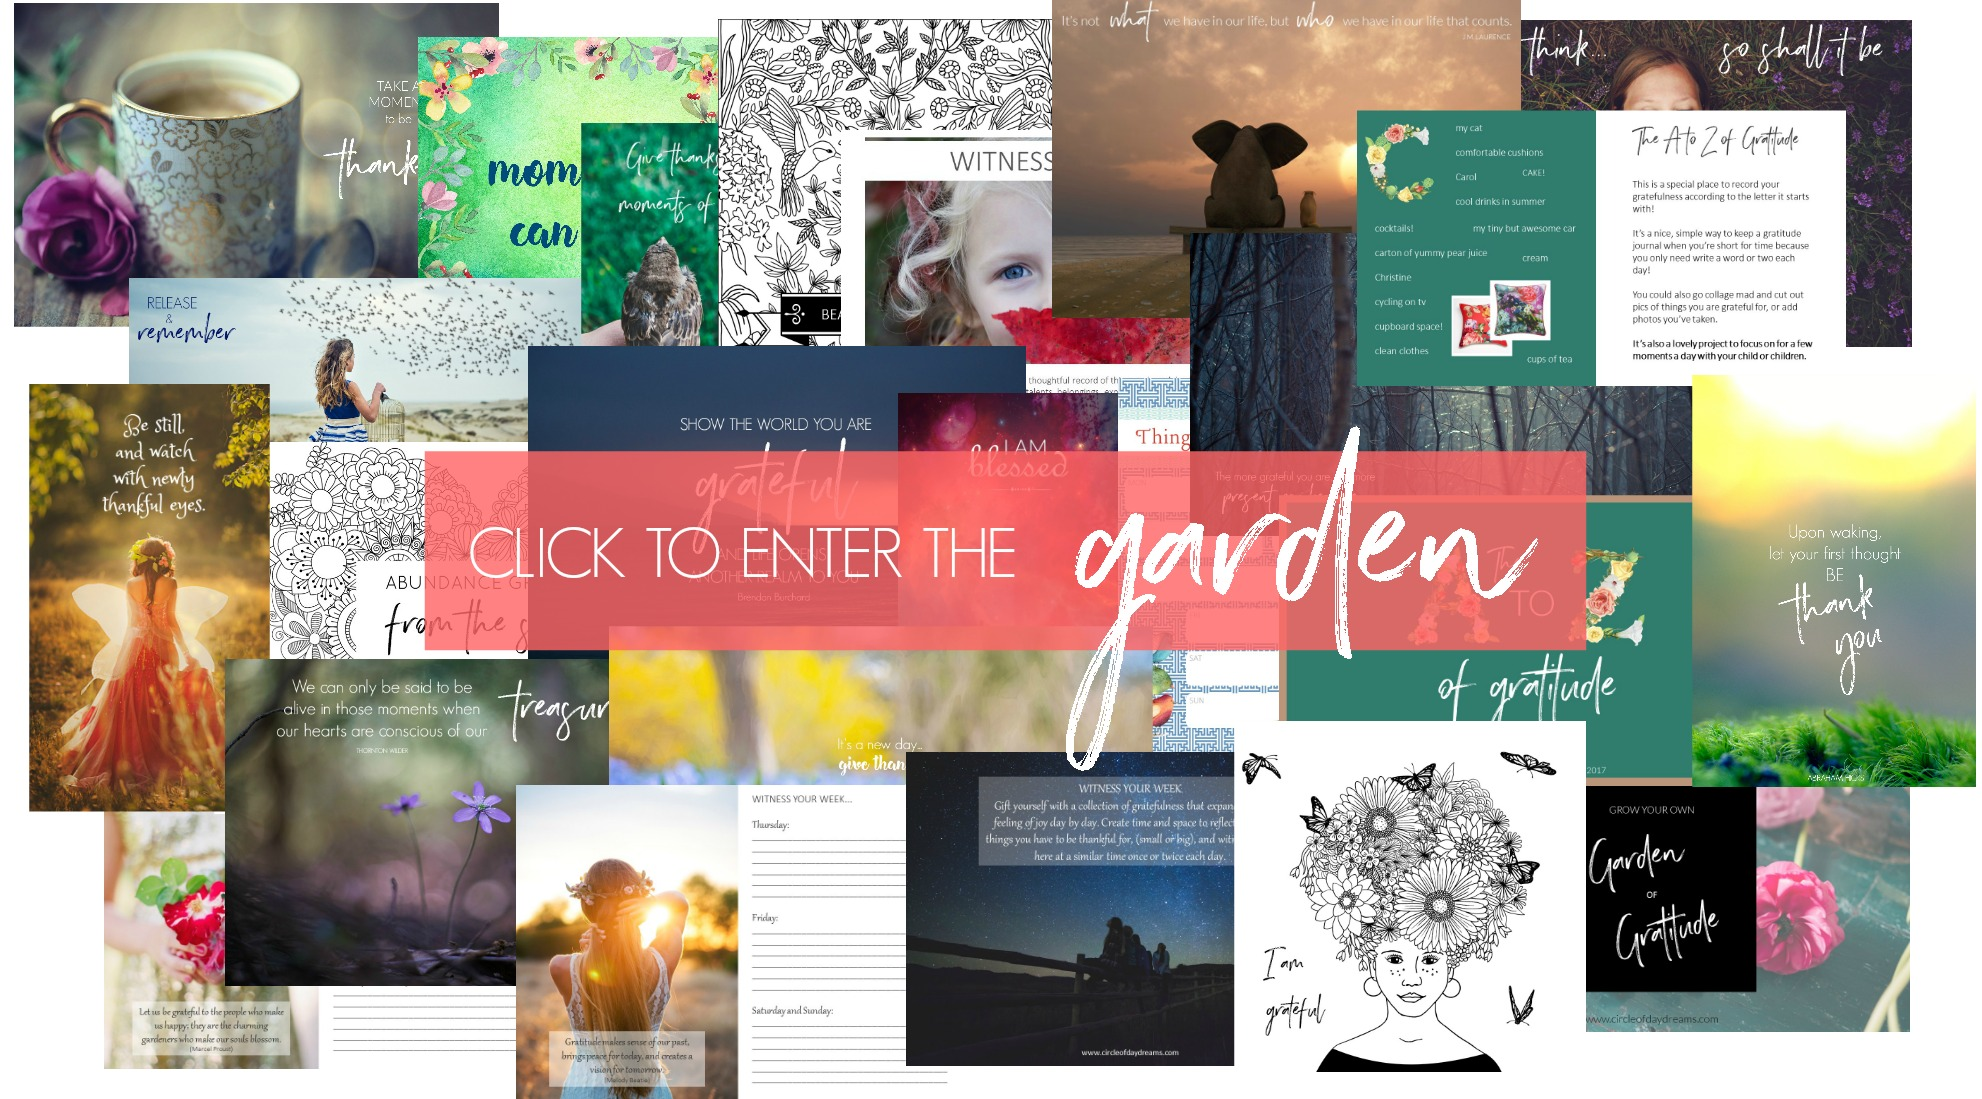 Check out the Garden of Gratitude. Circle of Daydreams. www.circleofdaydreams.com